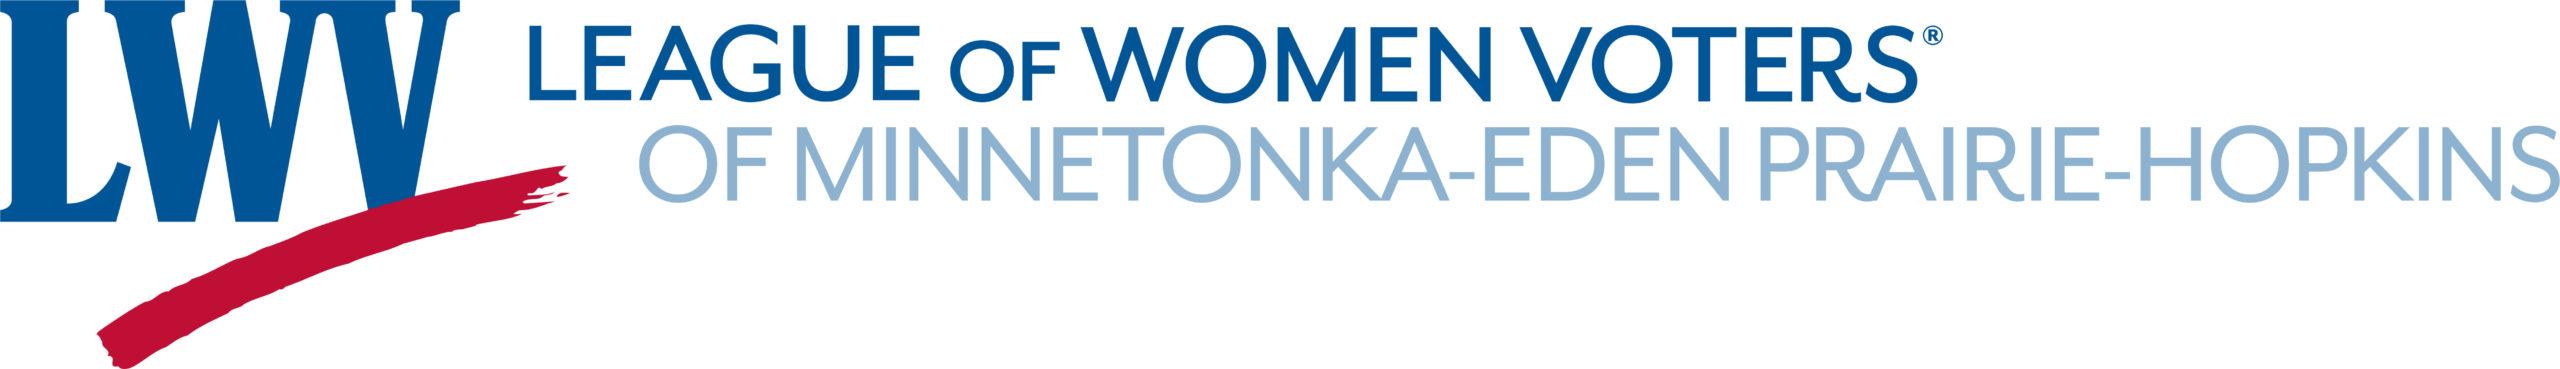 League of Women Voters of Minnetonka - Eden Prairie - Hopkins